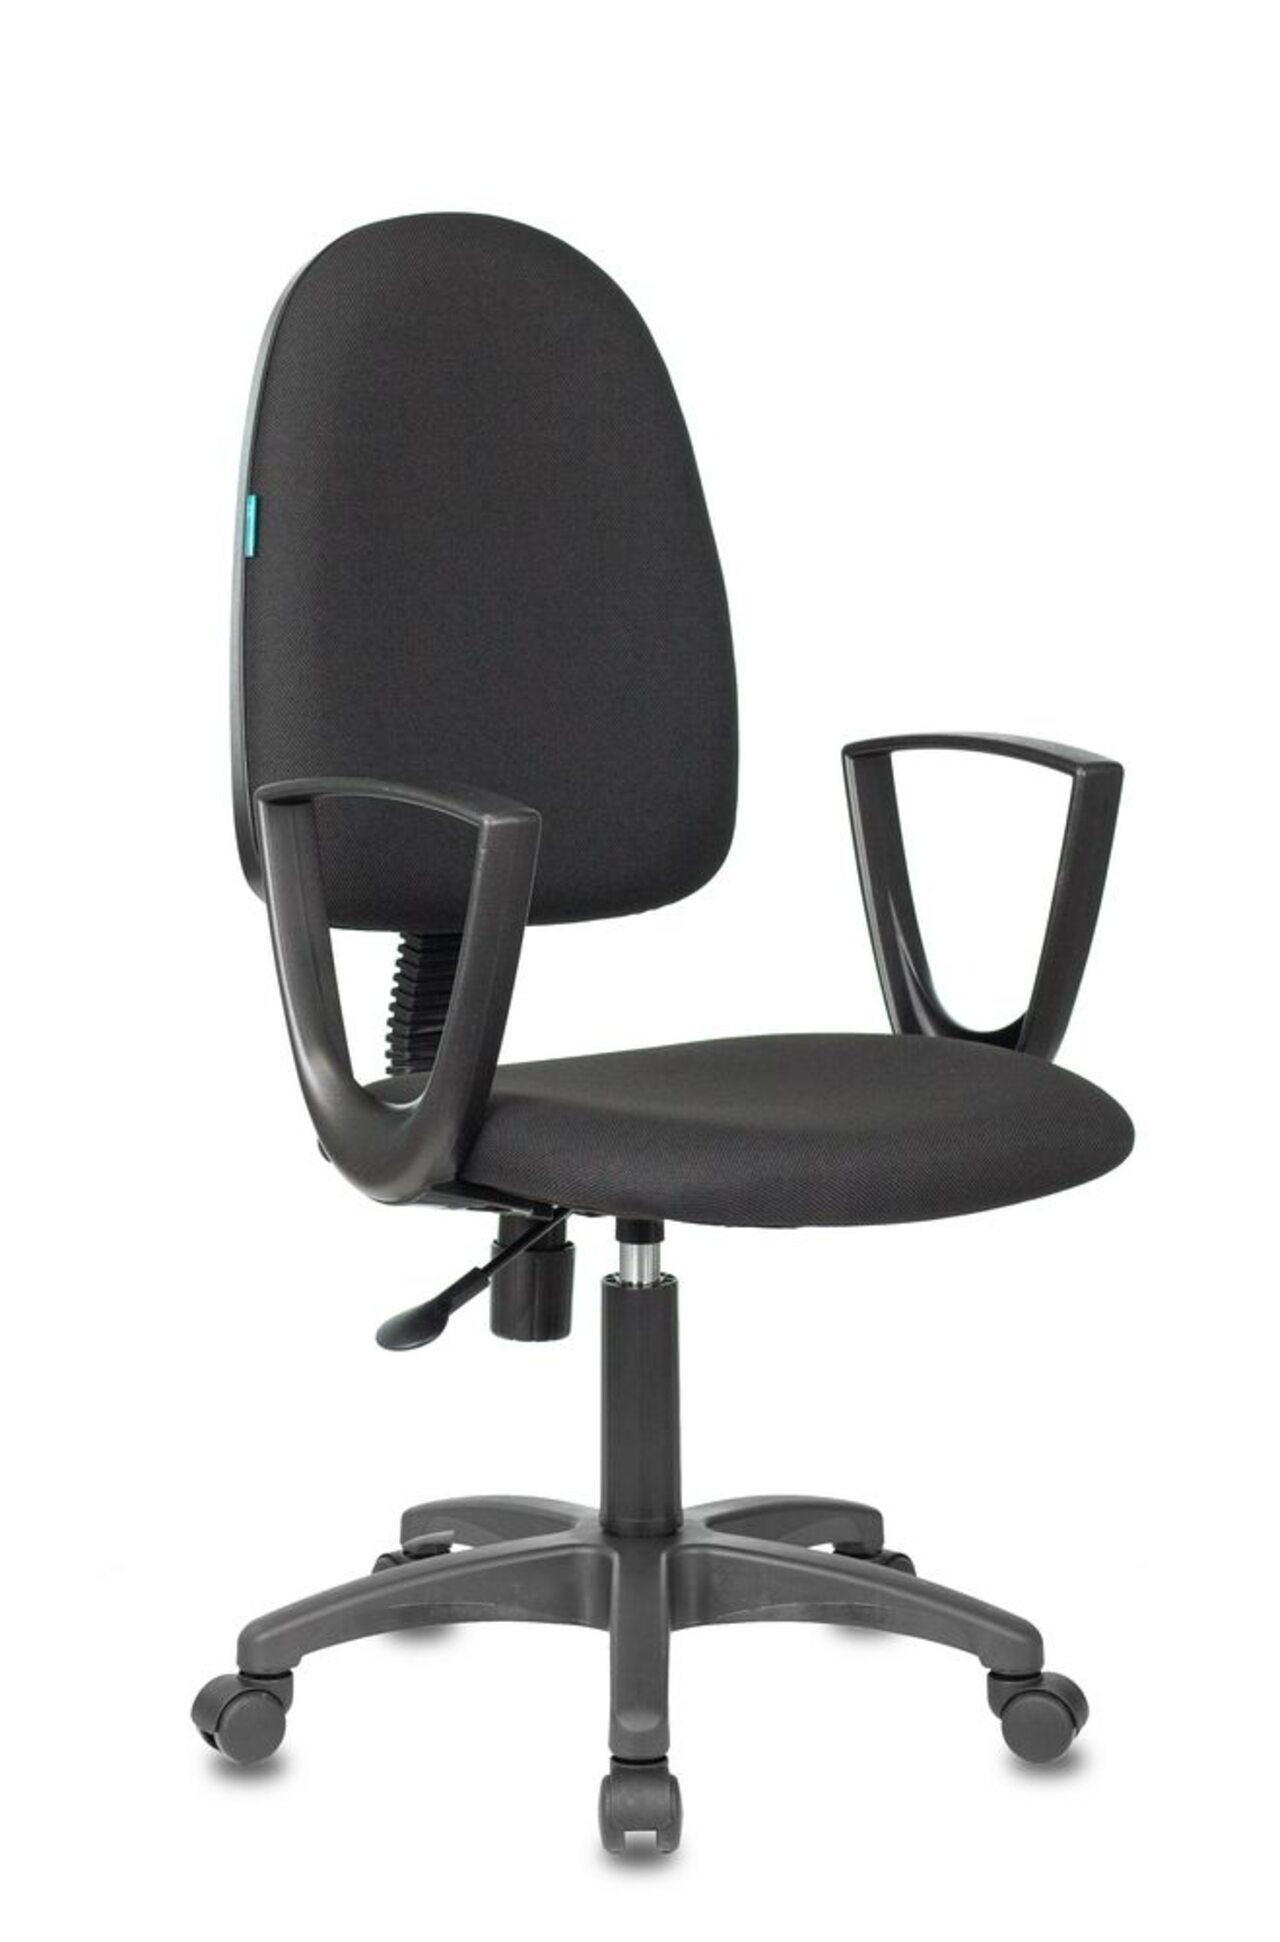 Кресло для персонала CH-1300N/3C - фото 4